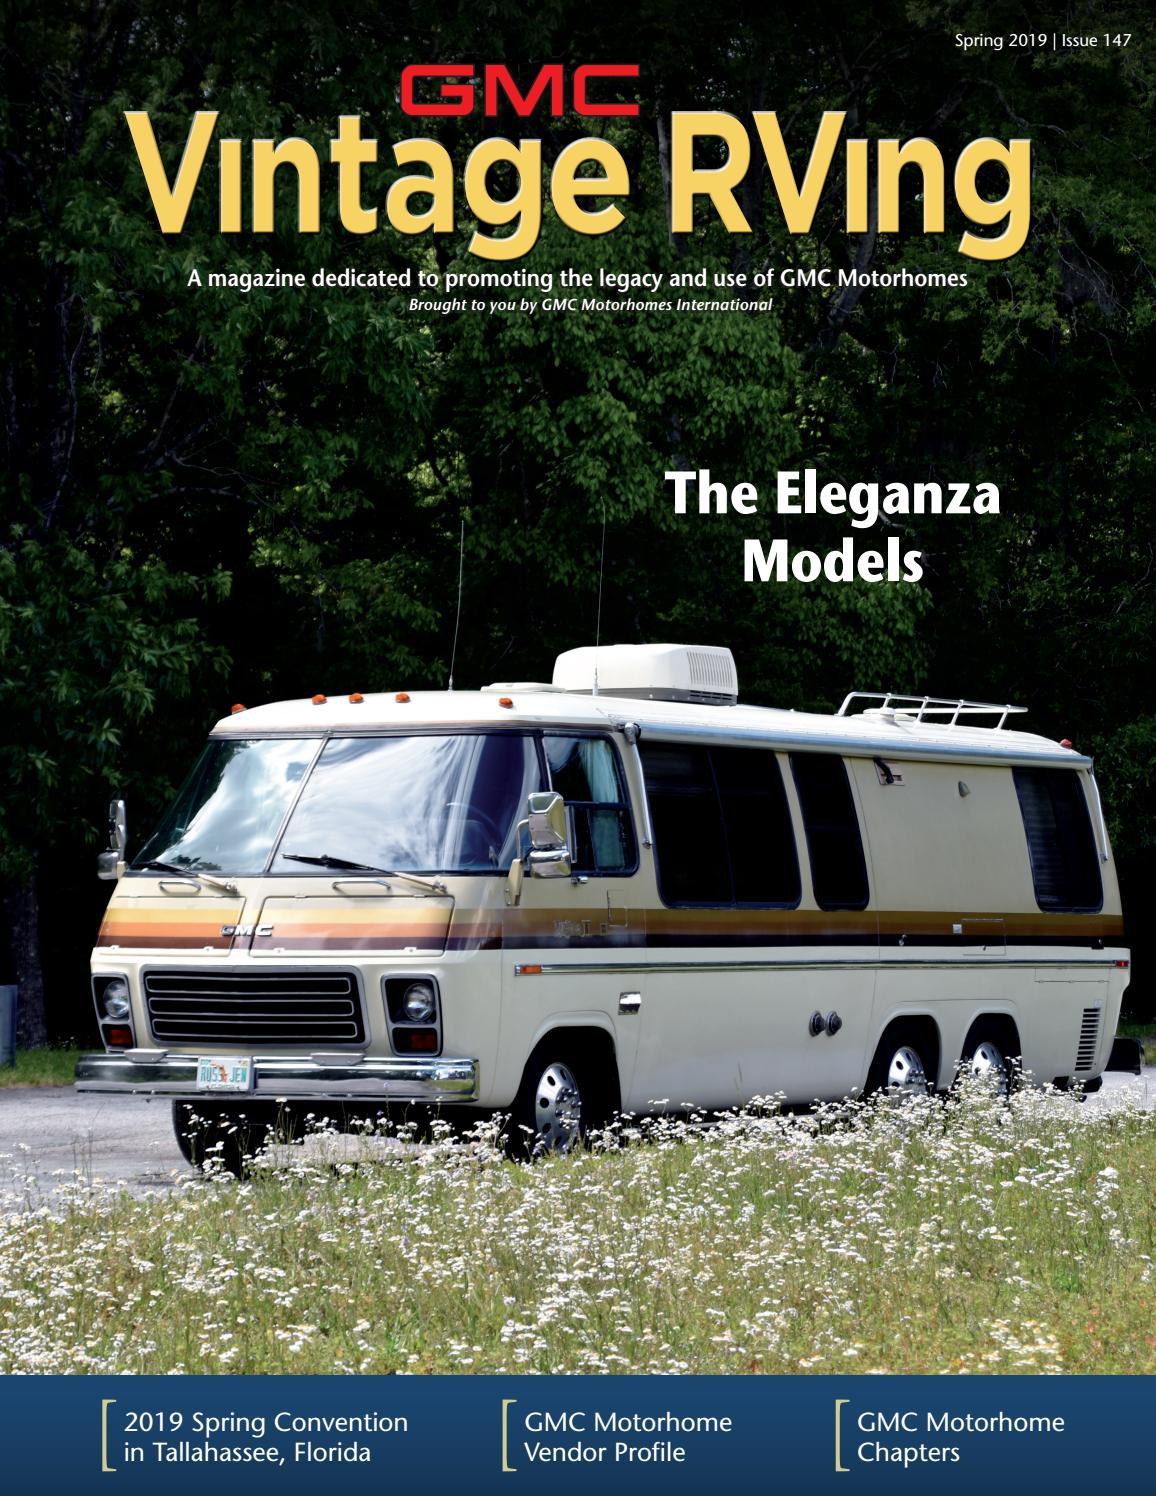 honda ev6010 wiring diagram gmc vintage rving magazine spring 2019 by ceva design issuu  gmc vintage rving magazine spring